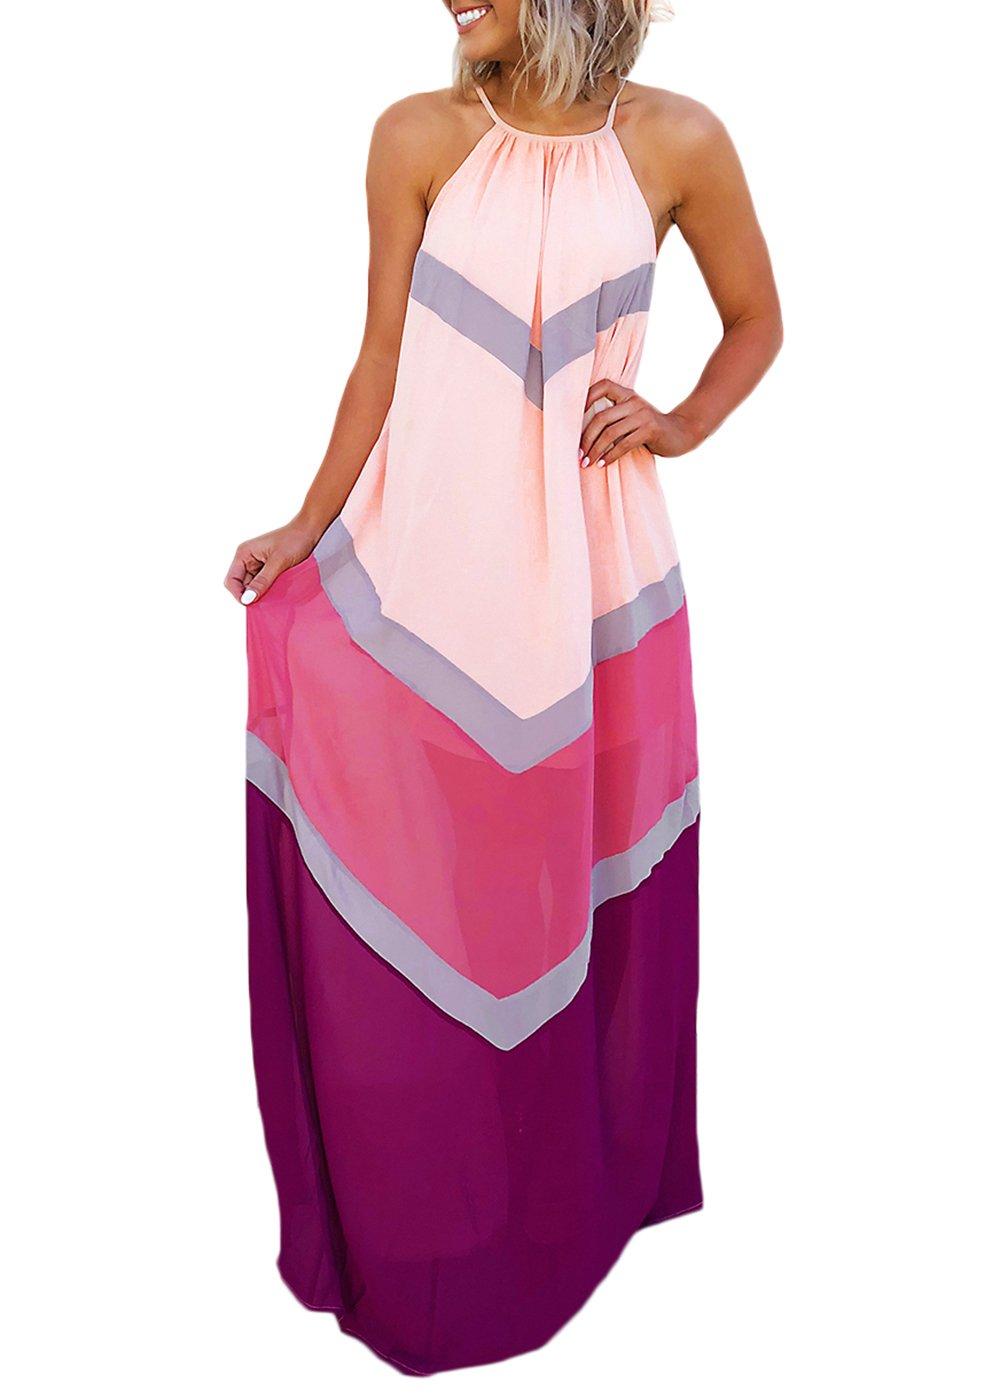 Joyfunear Women's Chiffon Halter Striped Color Patchwork Pleated Back Hollow Out Maxi Long Dresses Pink Purple Medium